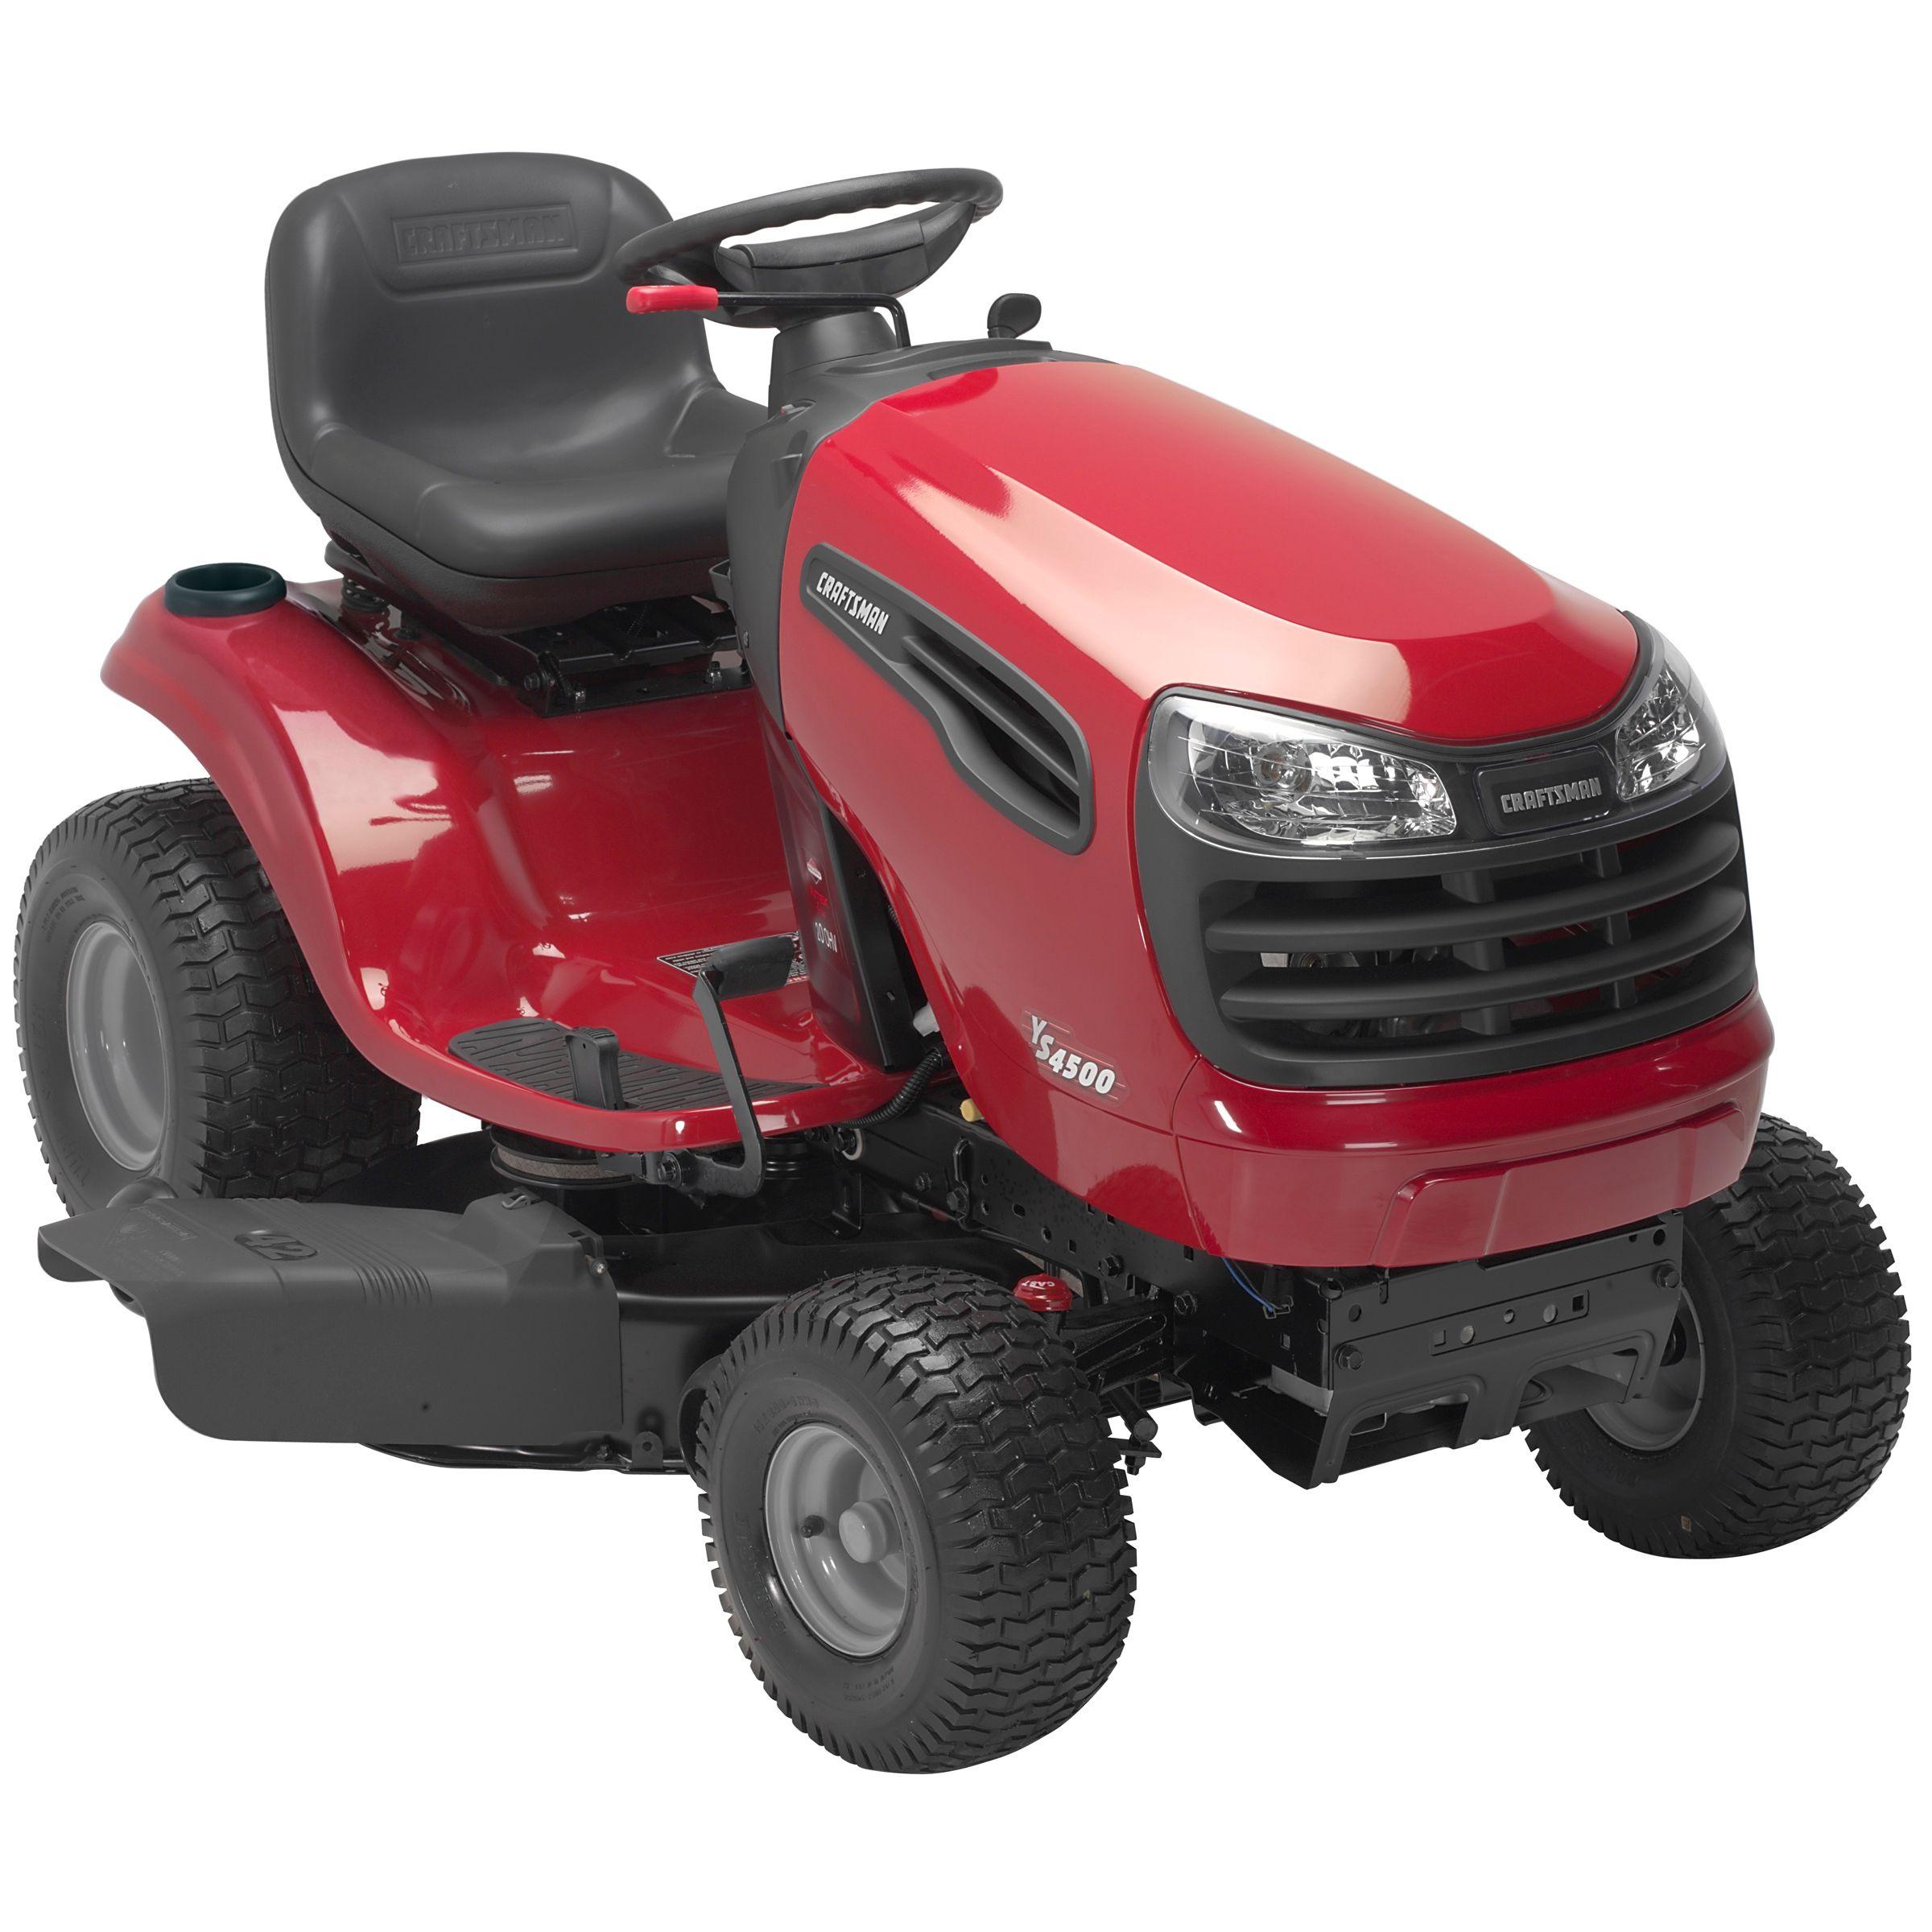 craftsman model 917288220 lawn tractor genuine parts lawn mower switch wiring diagram wiring diagram craftsman garden tractor 917 273761 [ 2400 x 2400 Pixel ]